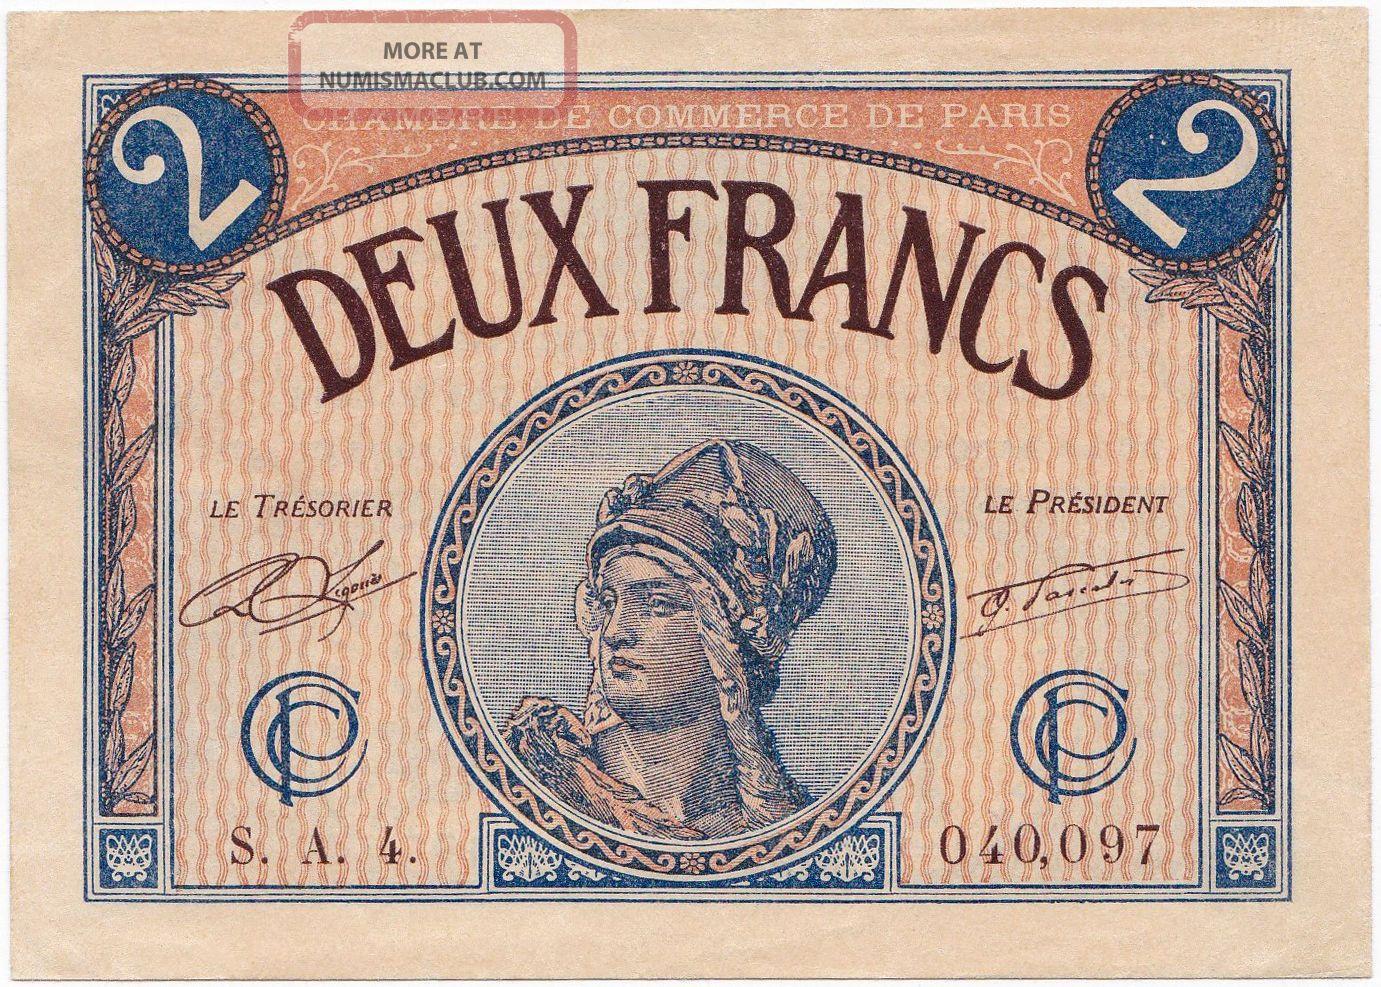 France 2 francs 1919 1922 xf chambre de commerce de paris for Chambre de commmerce